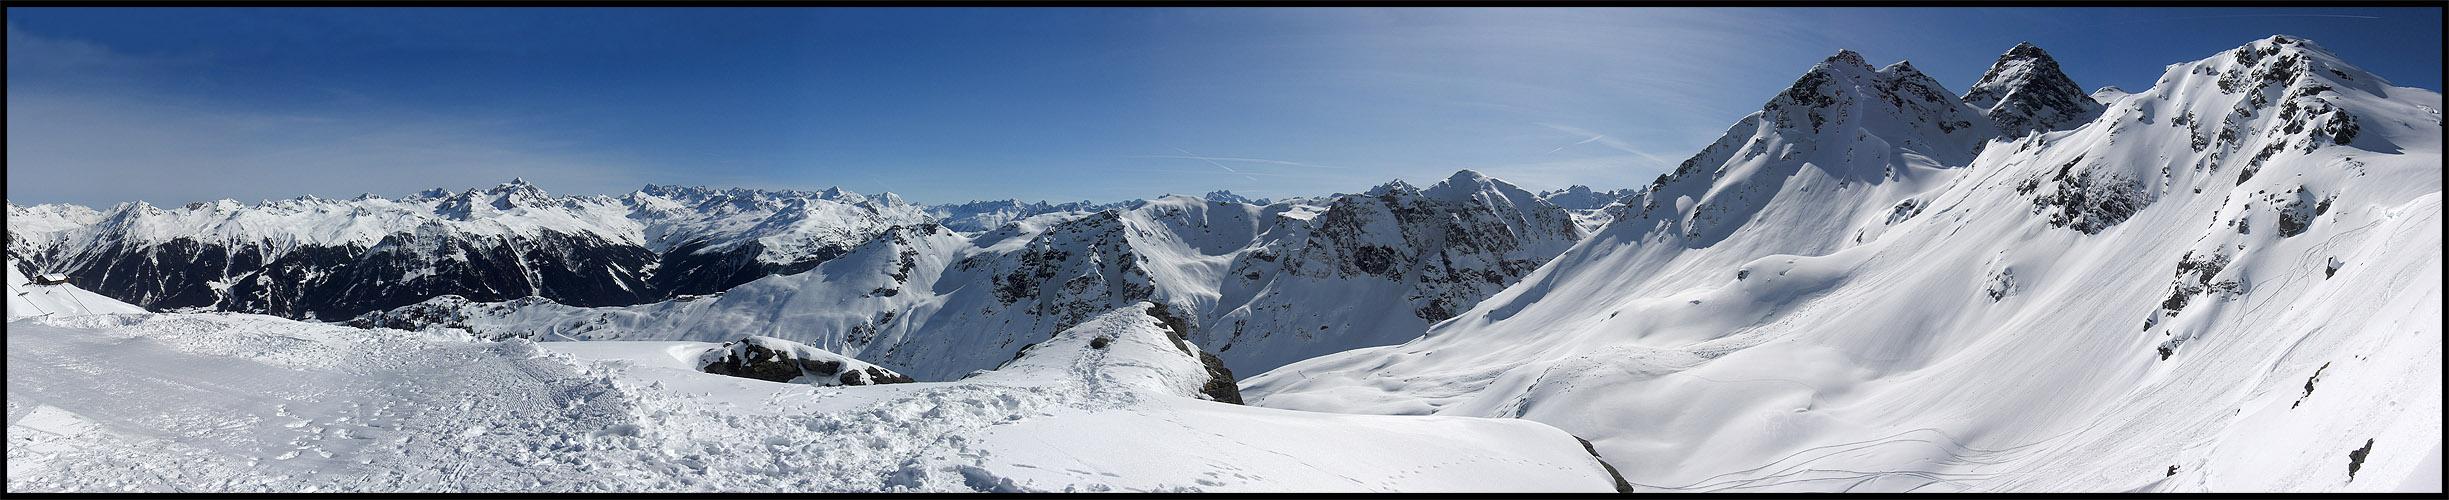 Bergpanorama - Montafon 2009